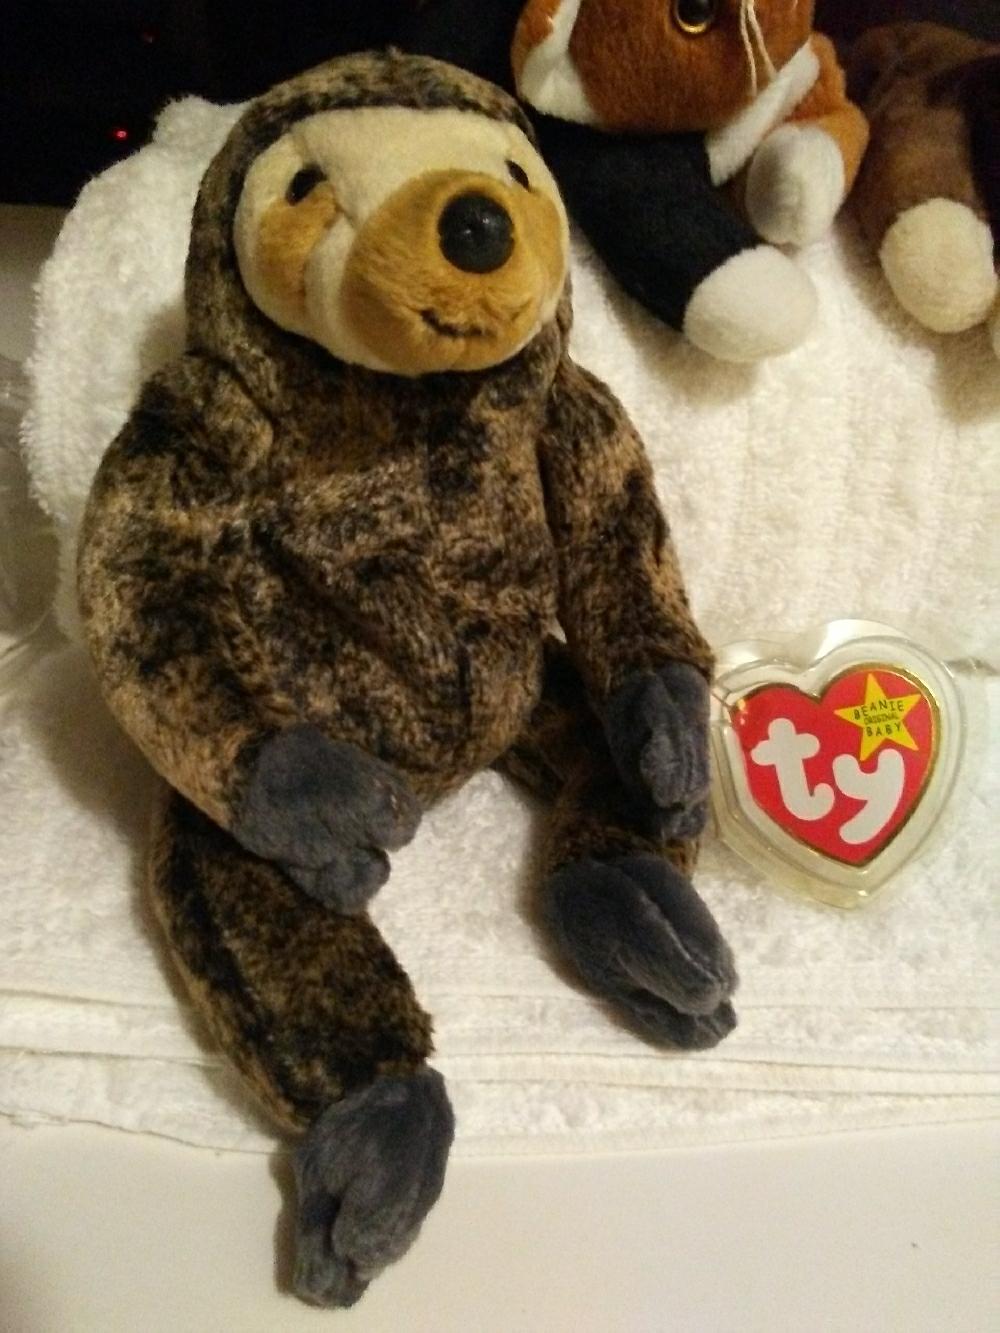 f8bd3e87864 0810180550a. 0810180550a. Ty original RETIRED Slowpoke the sloth beanie baby.  Ty original RETIRED Slowpoke ...